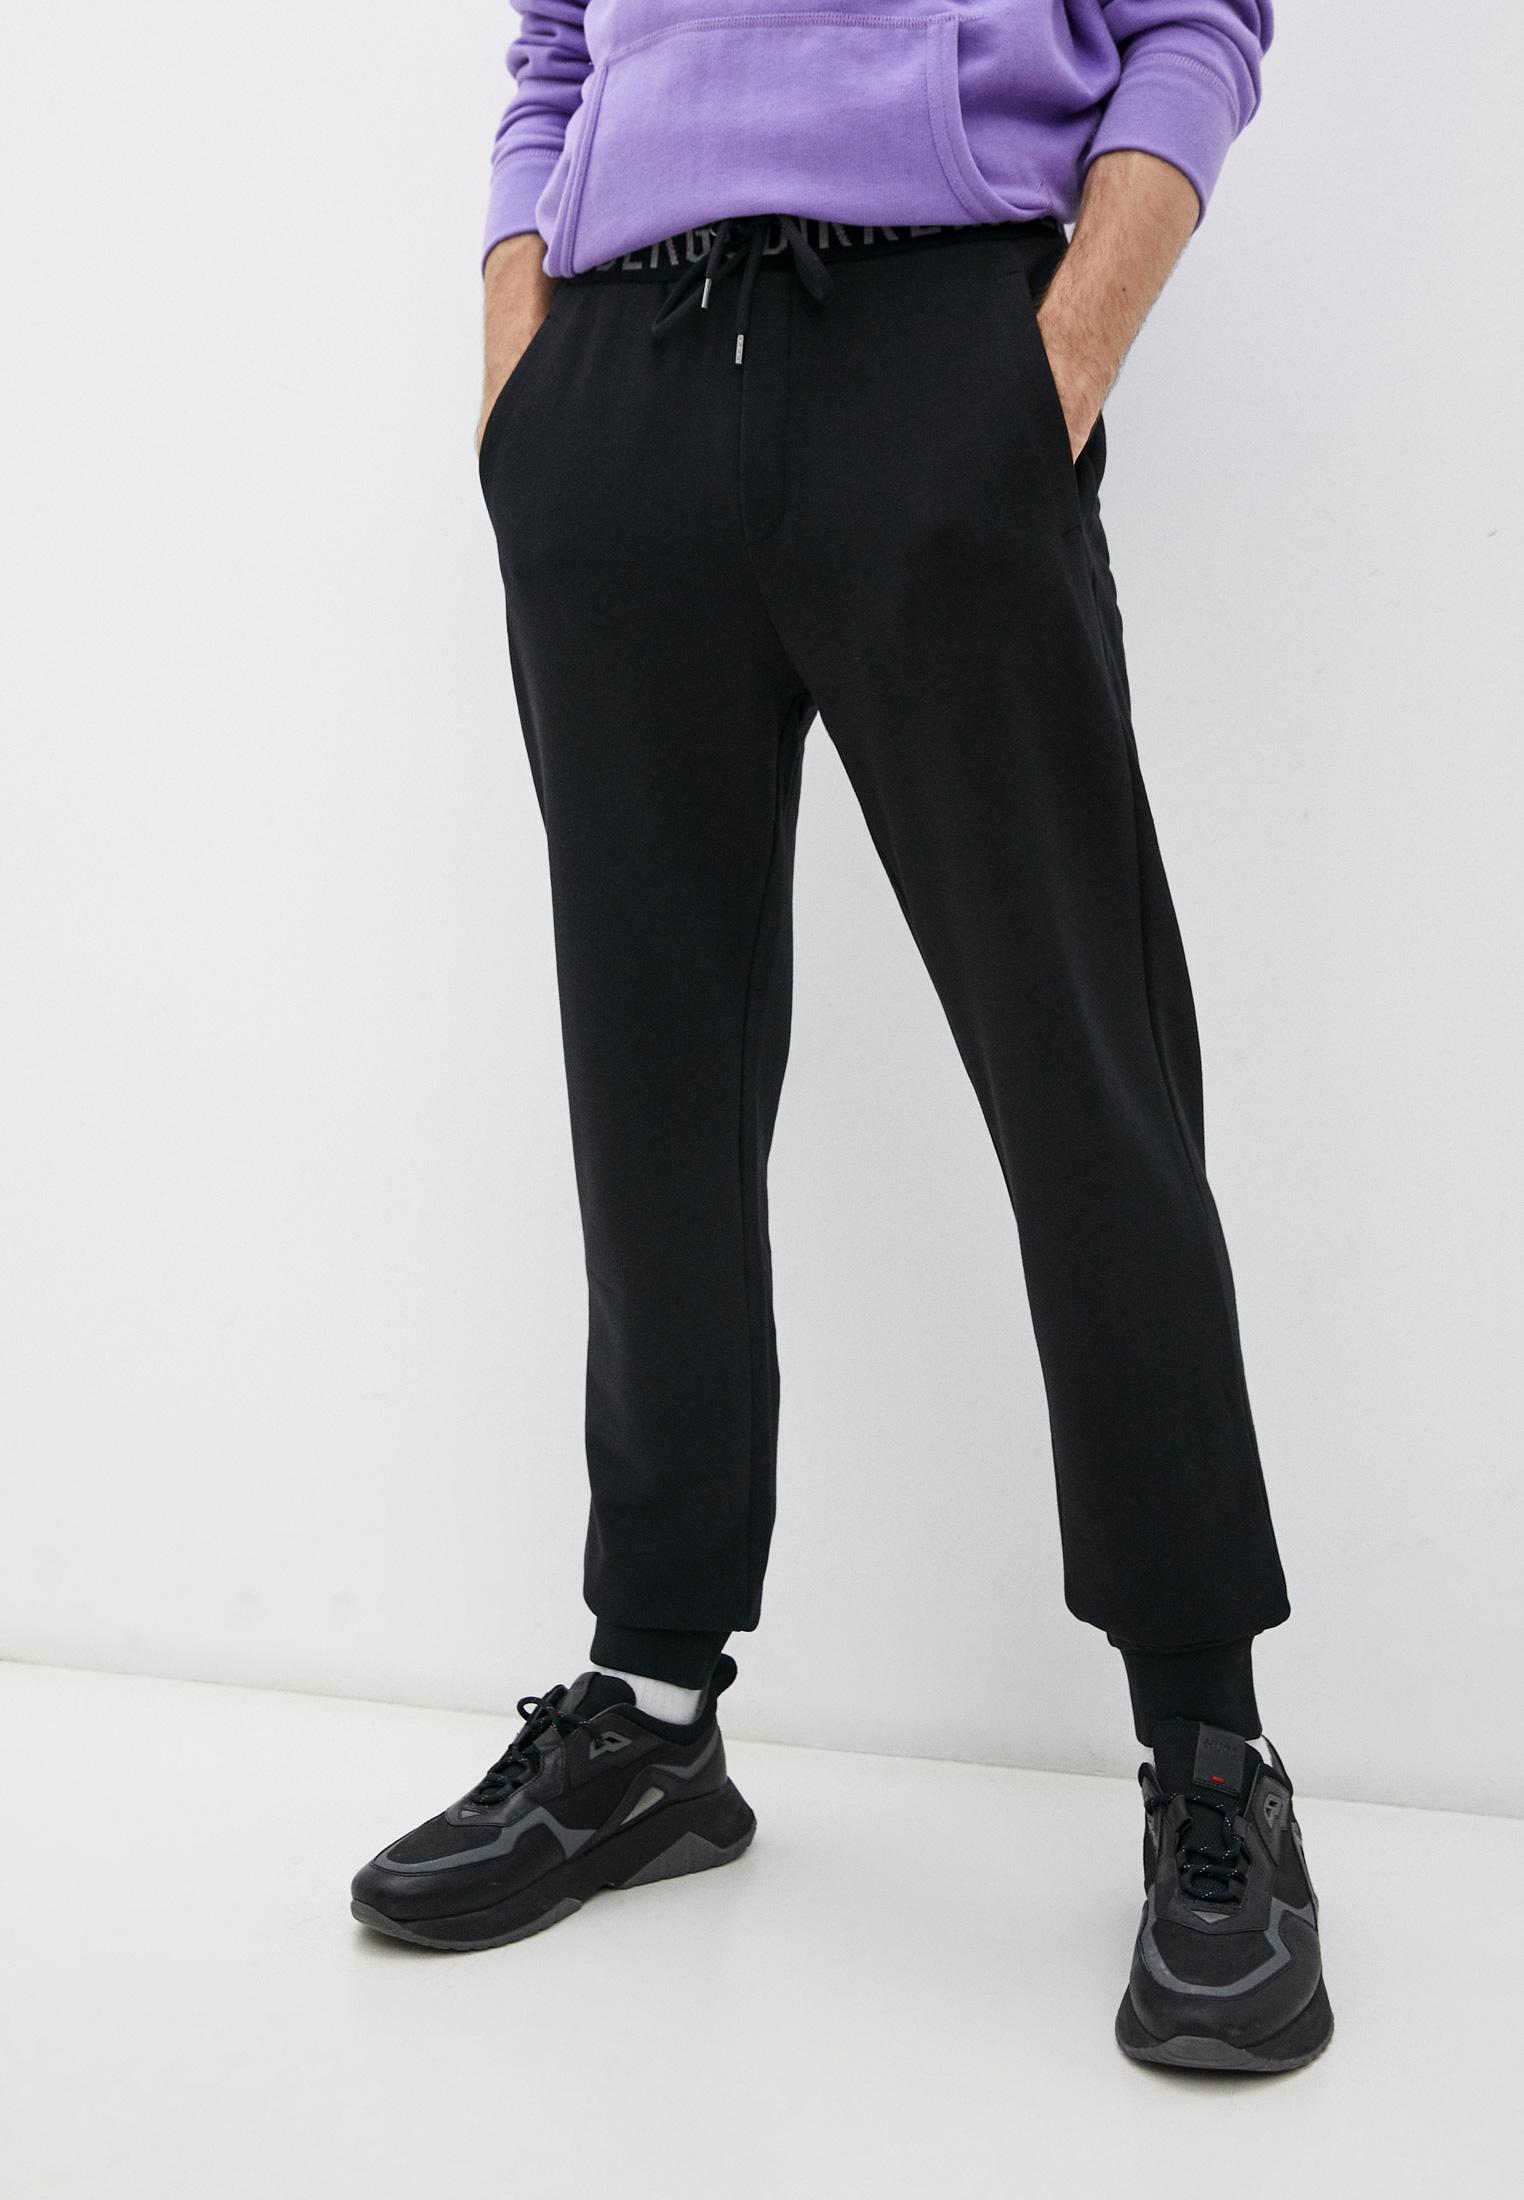 Мужские спортивные брюки Bikkembergs (Биккембергс) C 1 168 00 M 4226